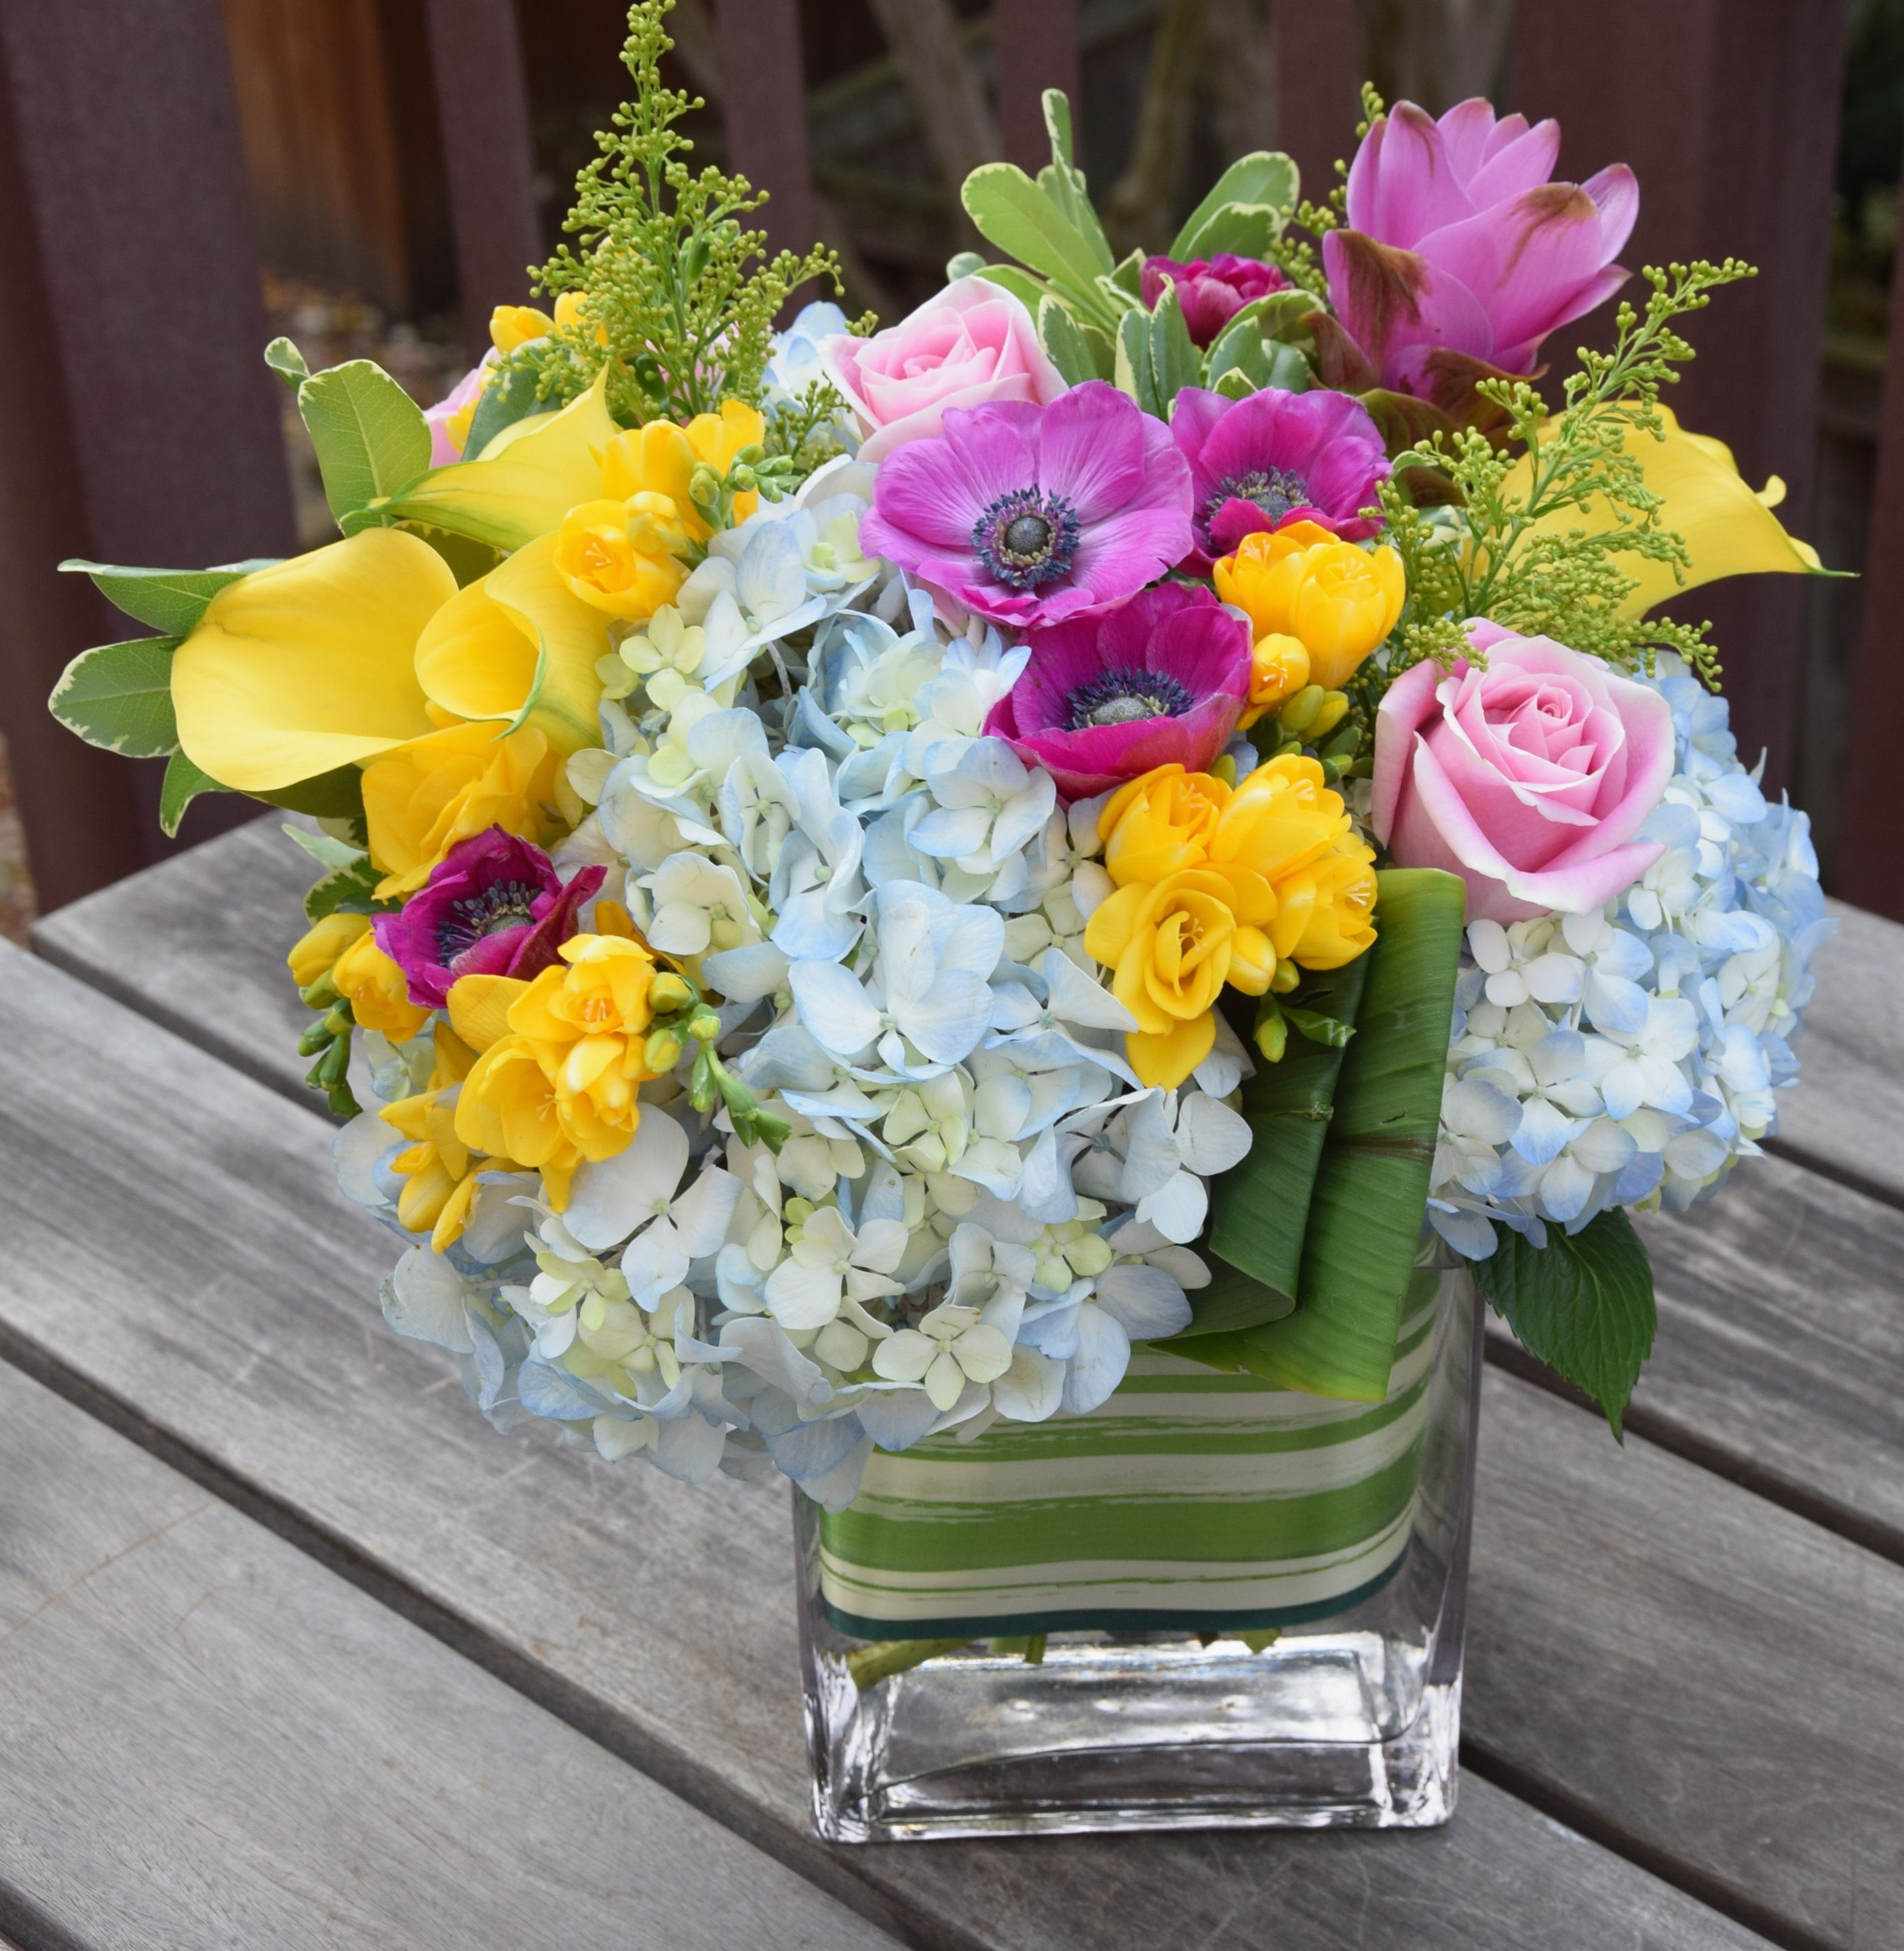 Flower Arrangement In A Vase Cheer Me Up Style Fresh Flowers Arrangements Flower Arrangements Flowers Bouquet